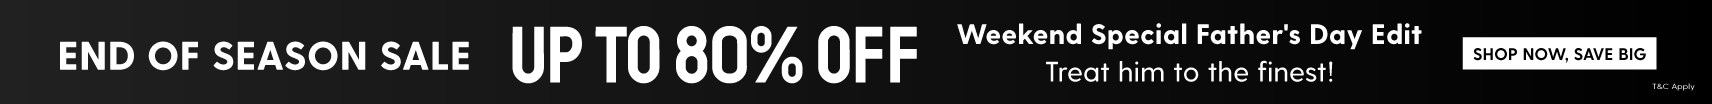 flash-sale-r2?utm_source=PDPPage&utm_medium=Banner&utm_campaign=EOSS-FathersDay